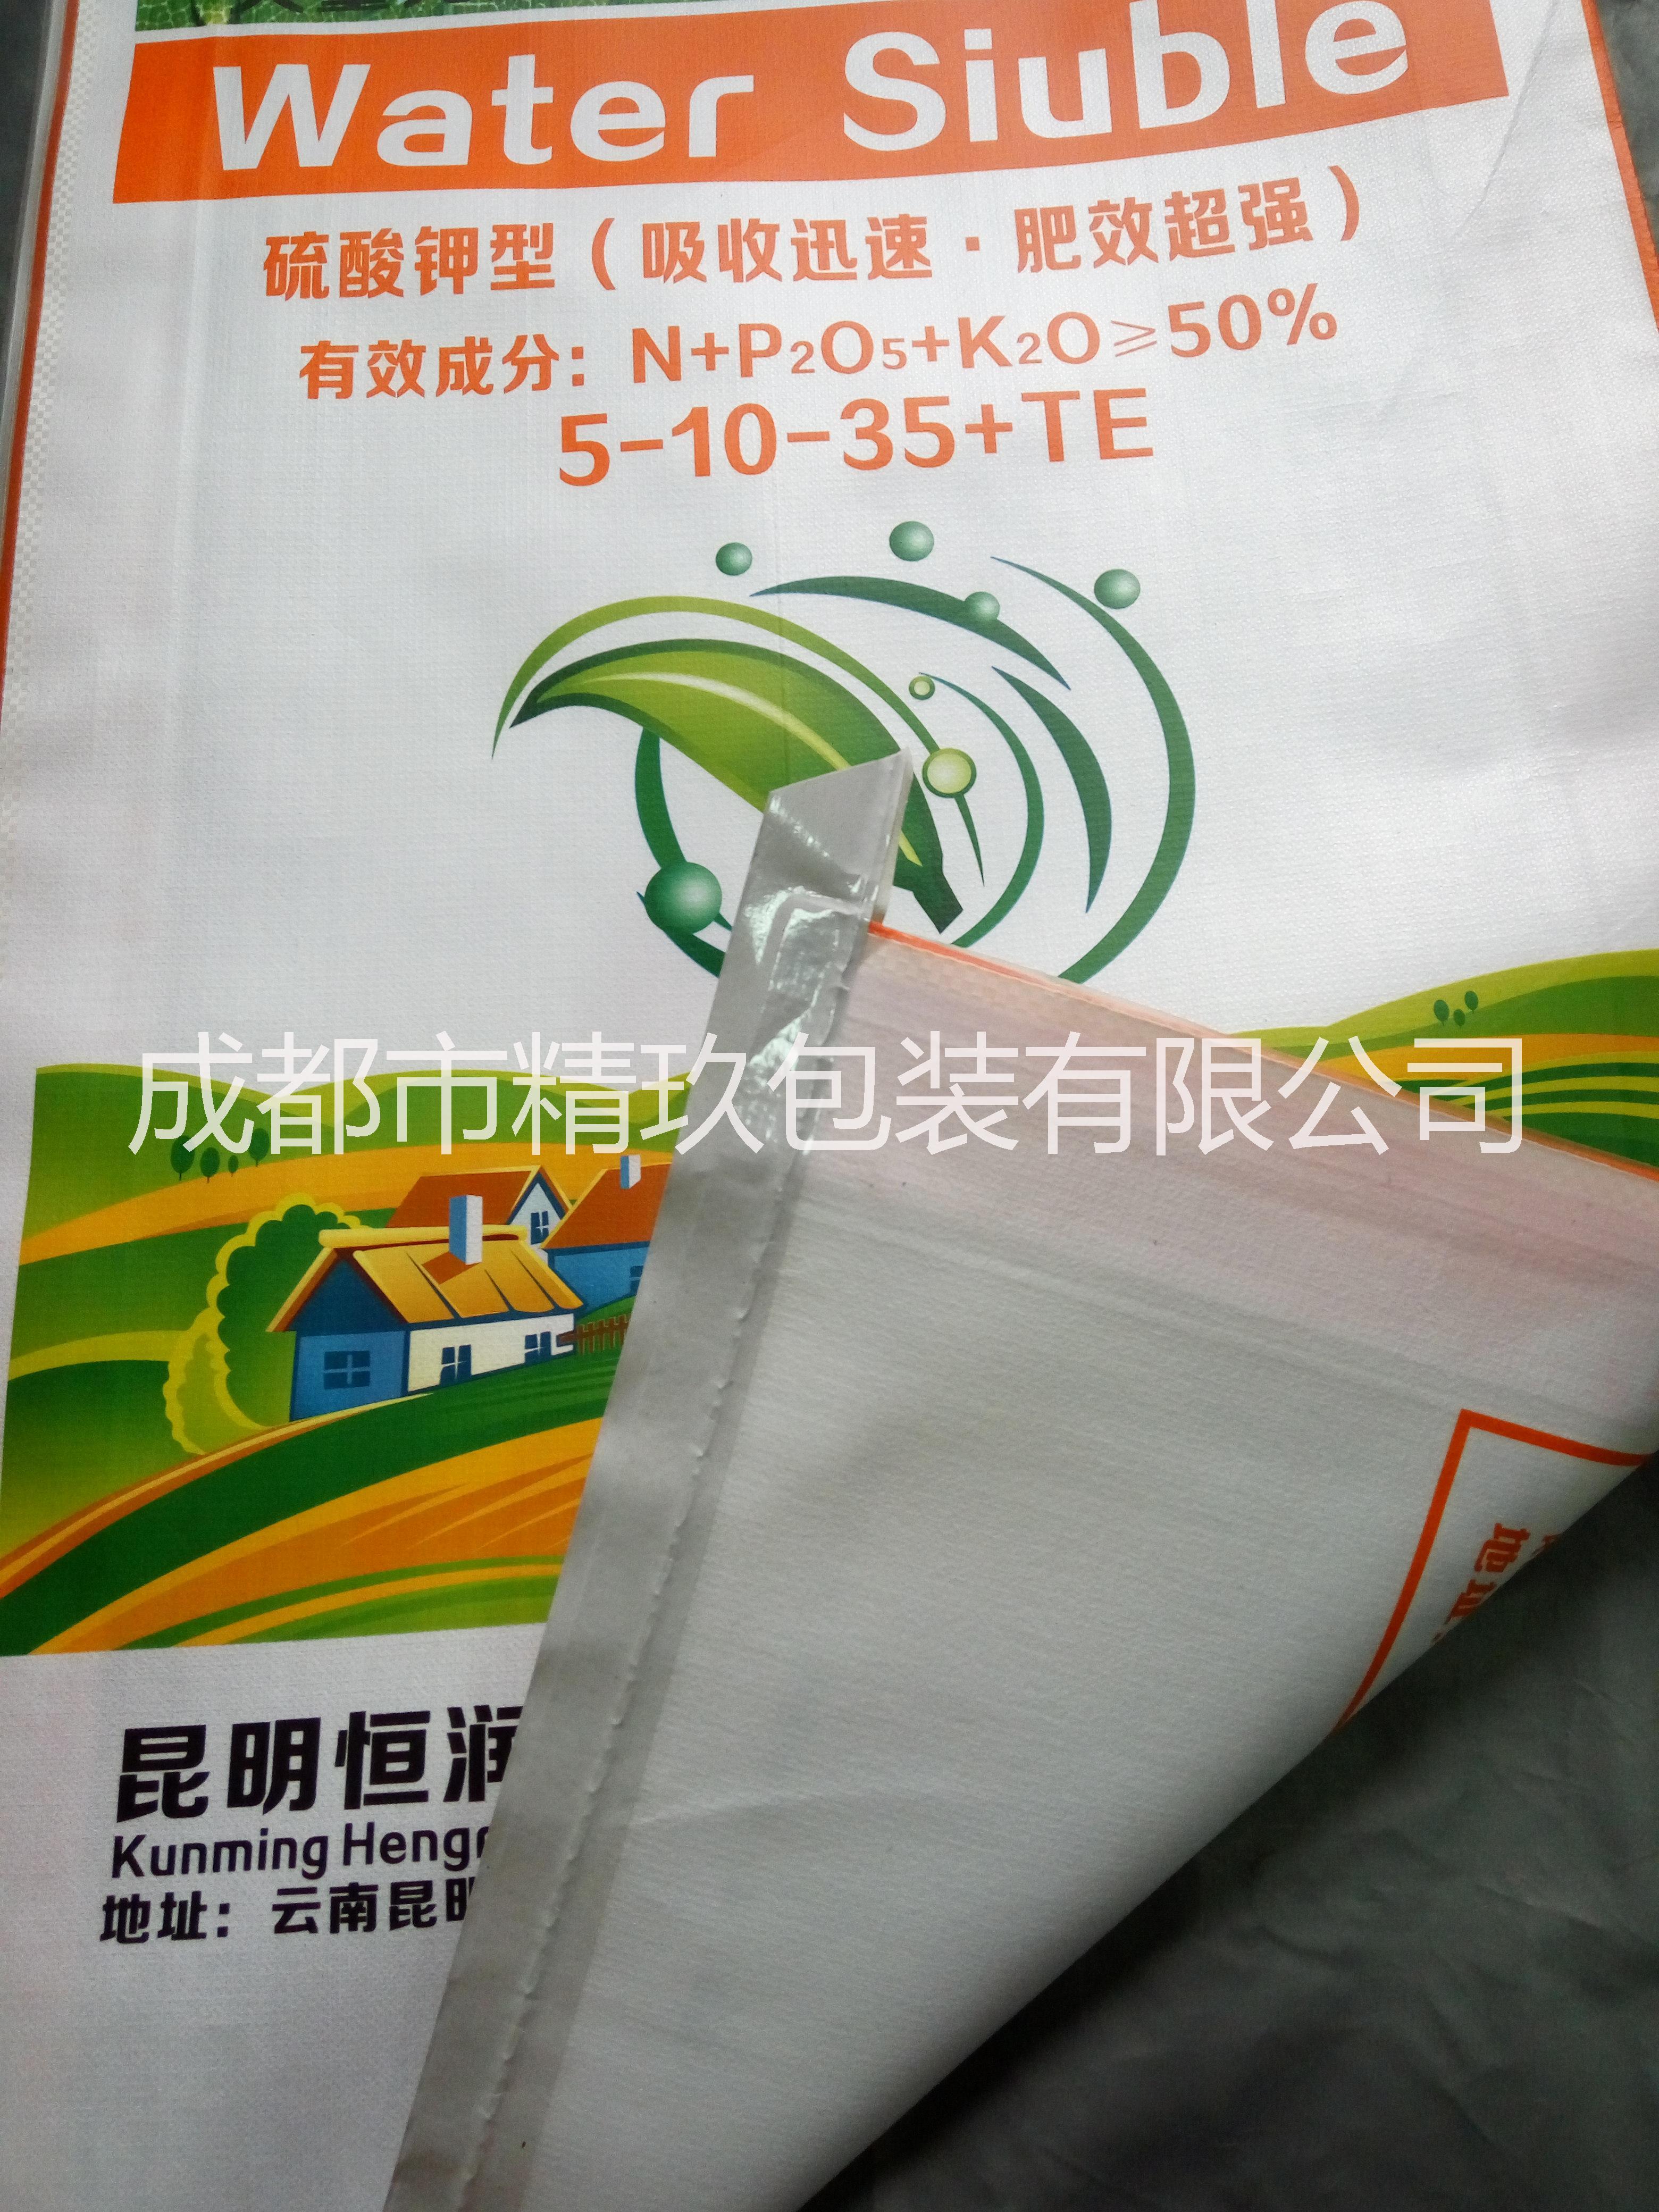 40kg大量元素水溶肥料编织袋,水溶肥料编织袋厂家,水溶肥料编织袋供应商,硫酸钾包装袋报价,肥料包装袋生产厂家